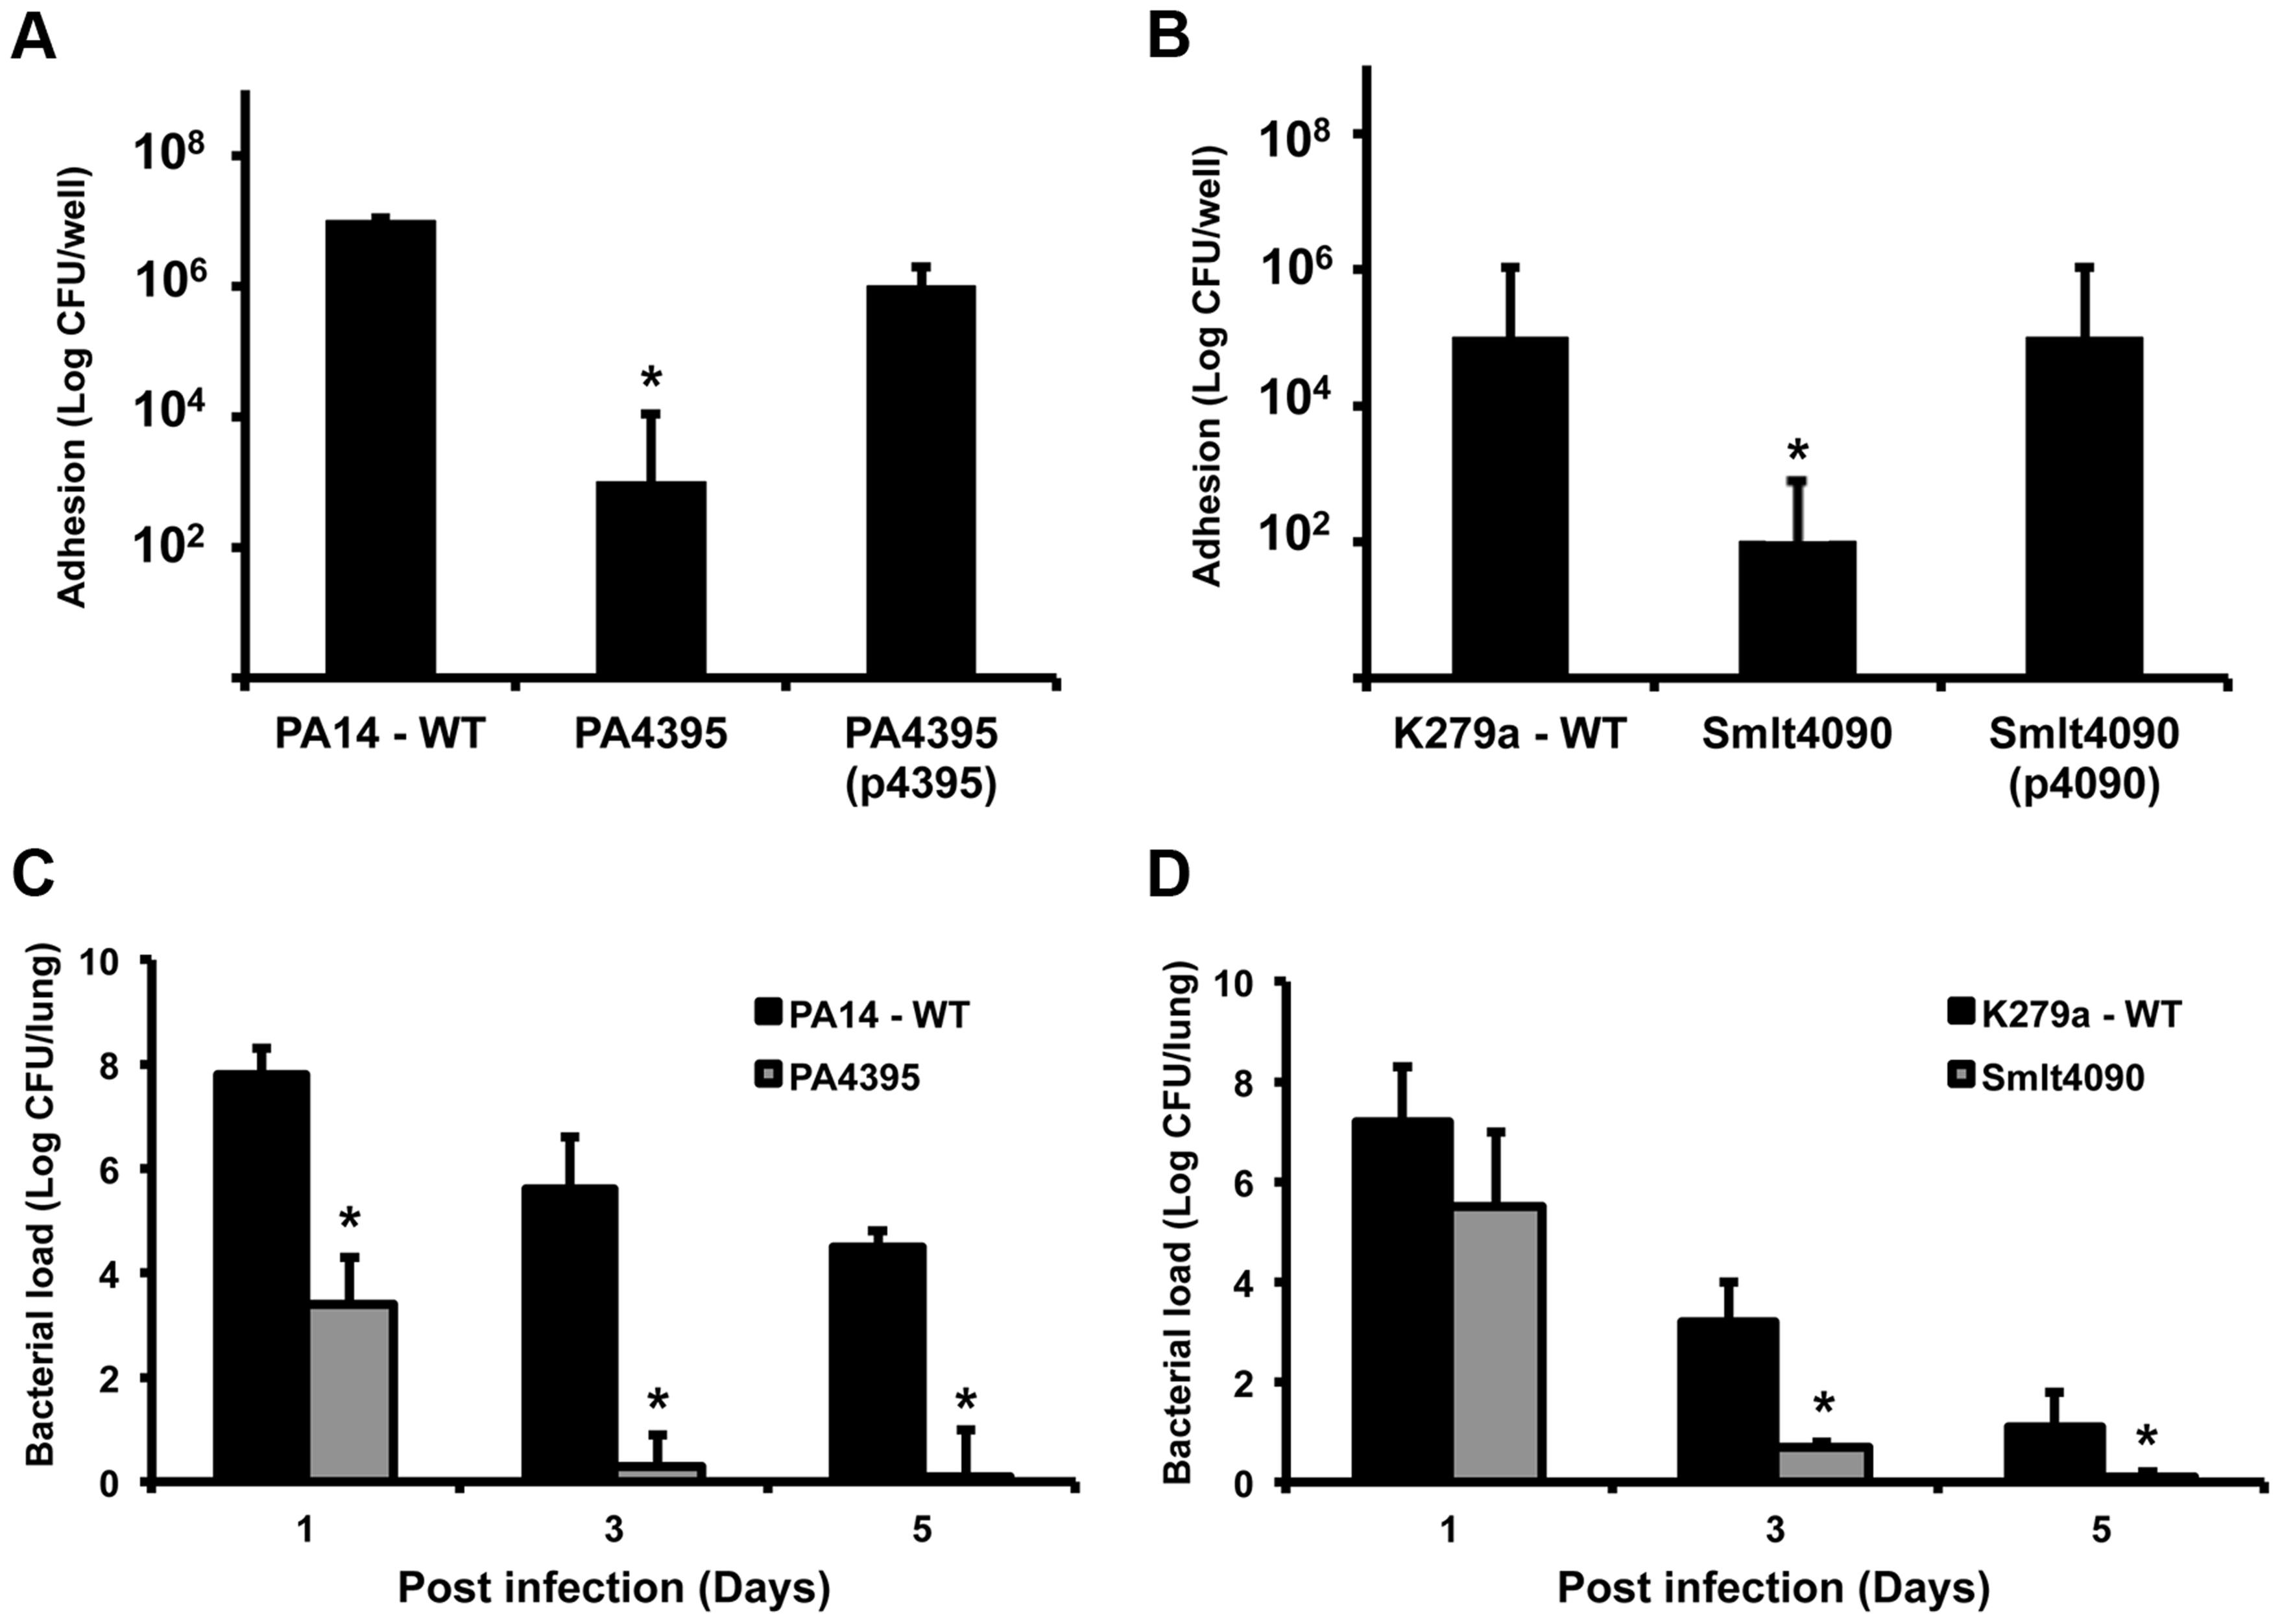 Roles for XC_3703 homologues in virulence of the human pathogens <i>Pseudomonas aeruginosa</i> and <i>Stenotrophomonas maltophilia</i>.